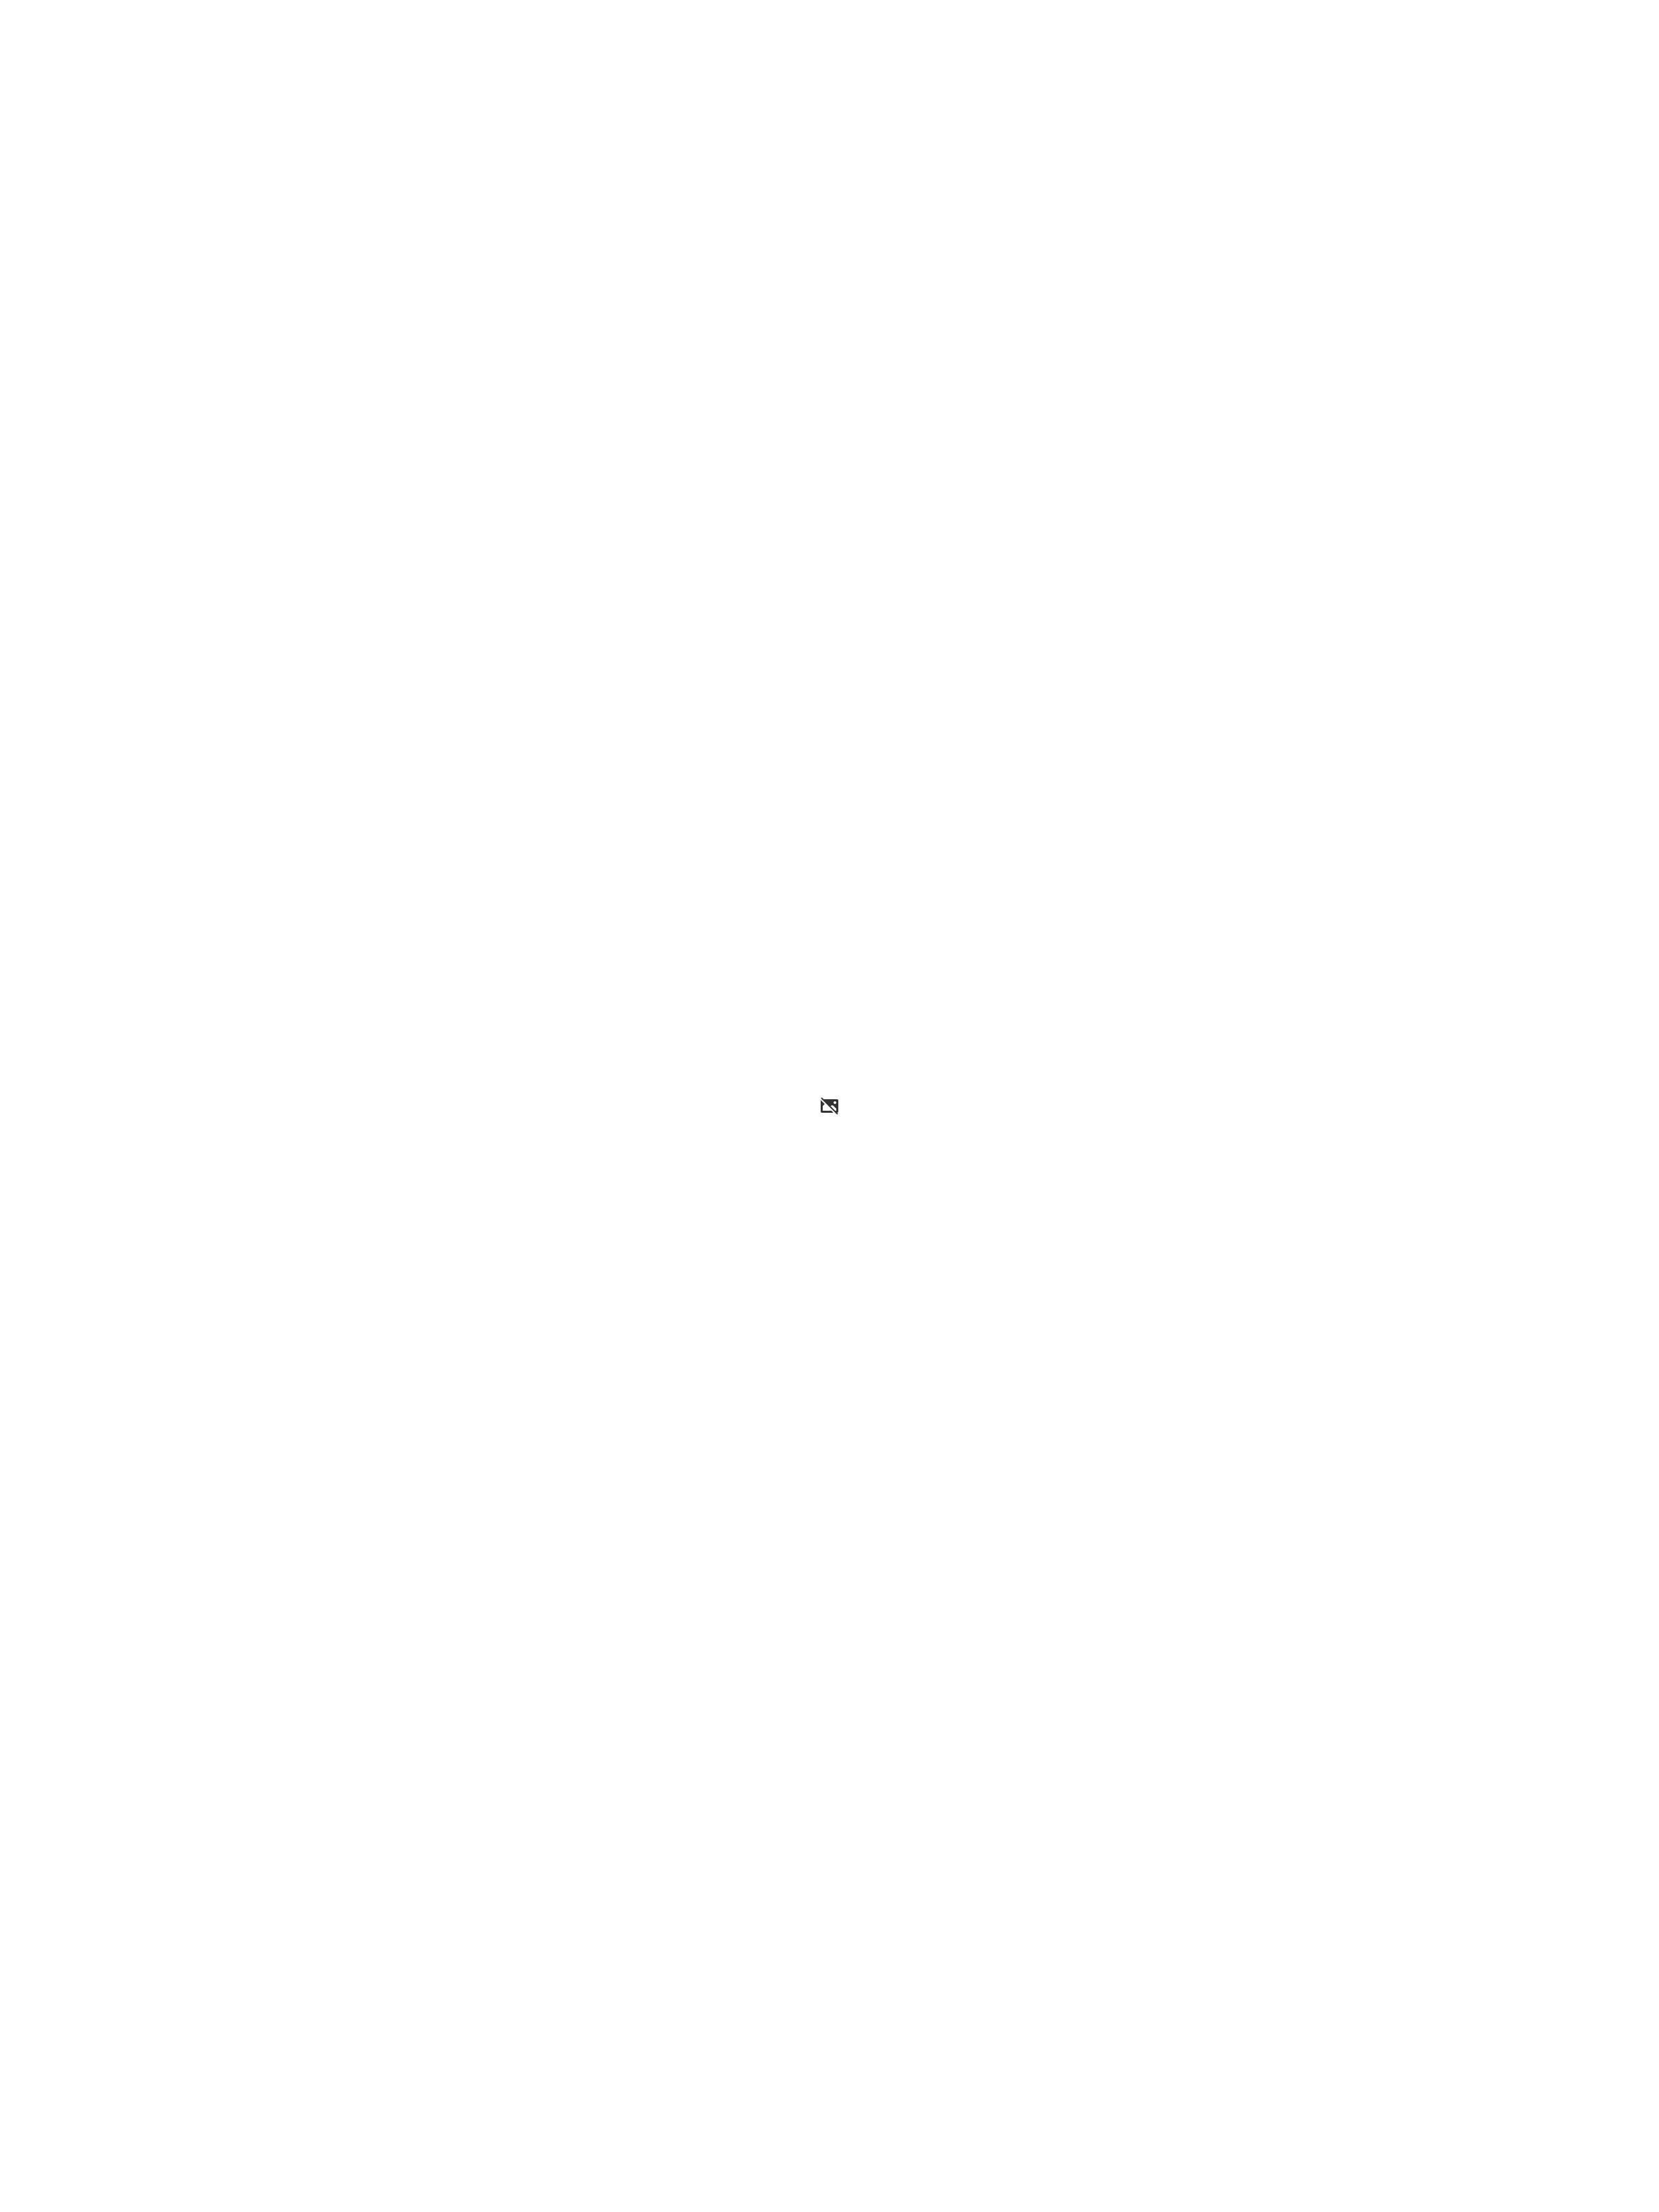 Graffiti LoL-owych bohaterów - Ziggs graffiti